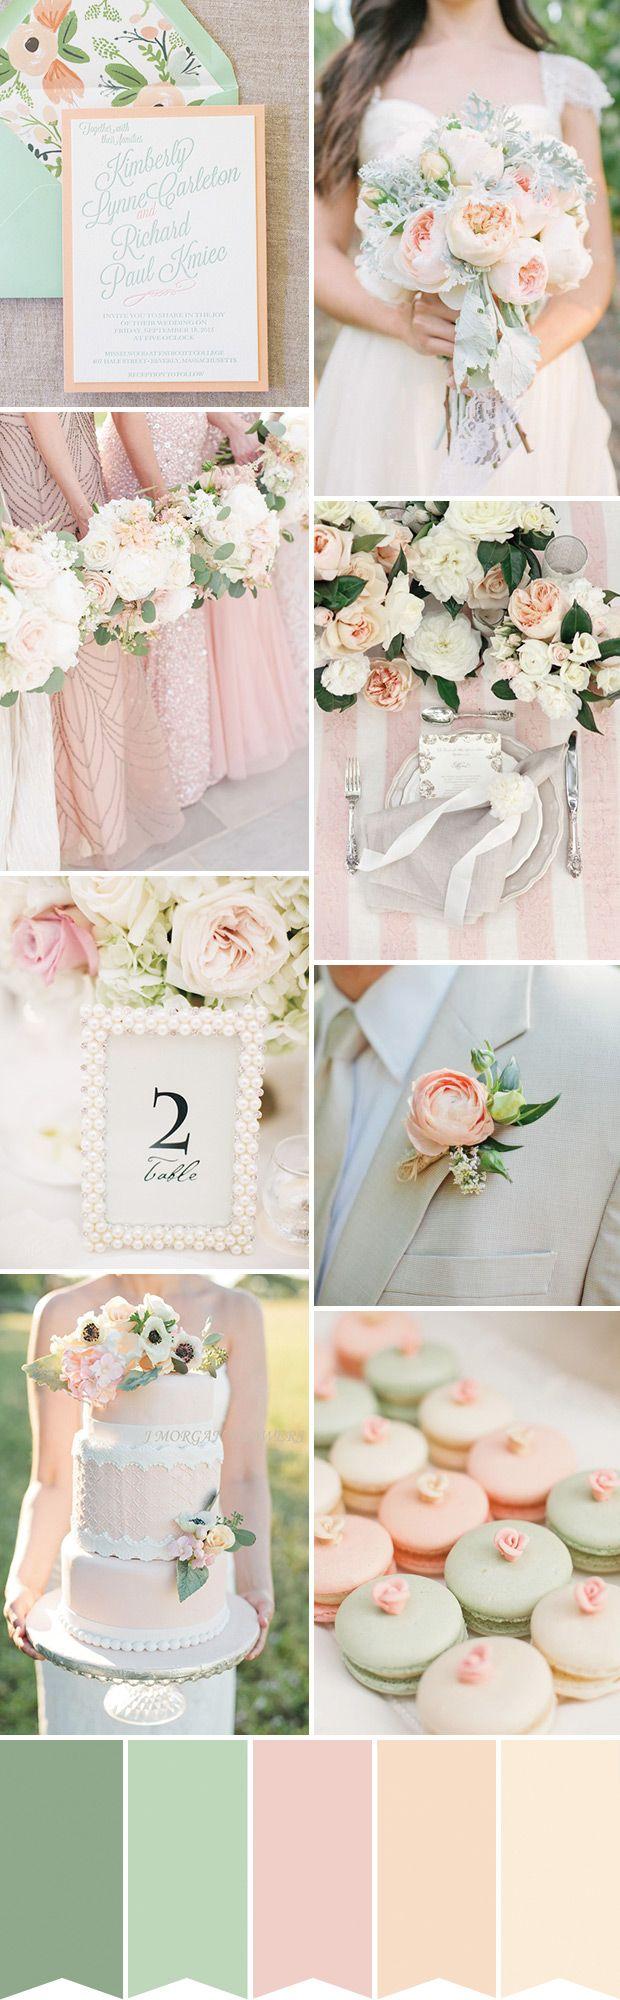 Softest Peach and Mint Wedding Inspiration // www.onefabday.com